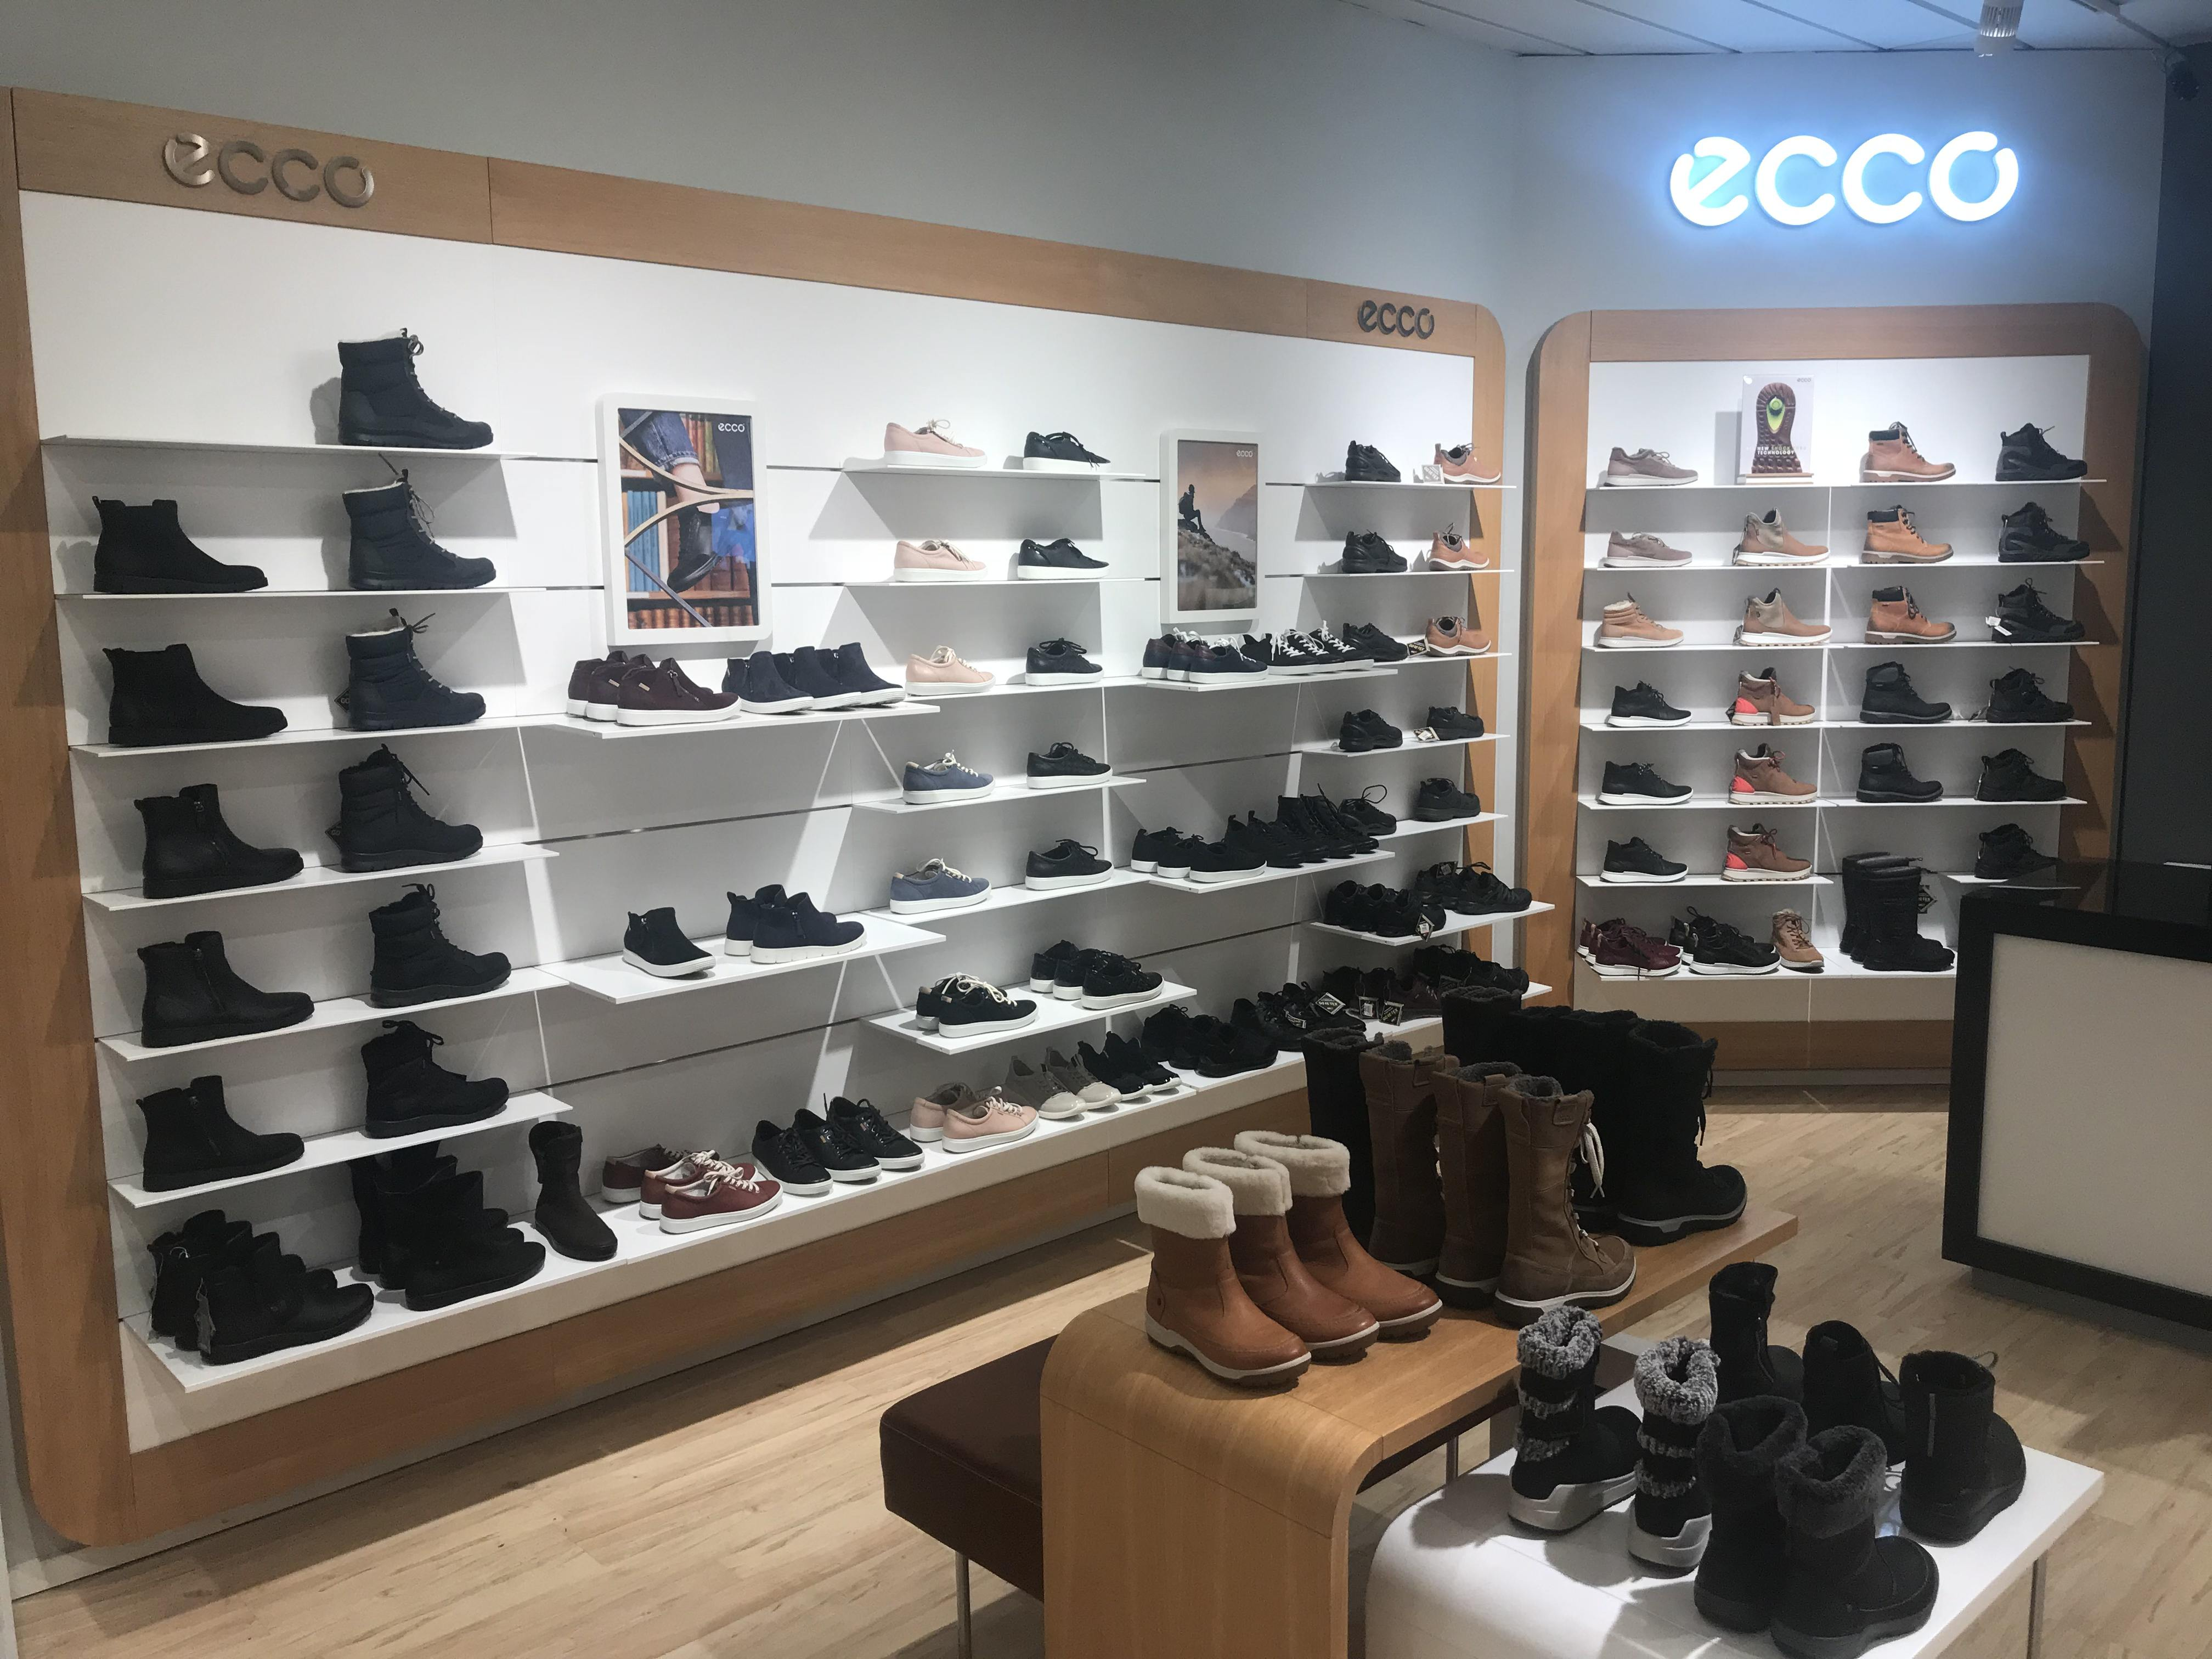 Ecco Store Odense Home | Facebook